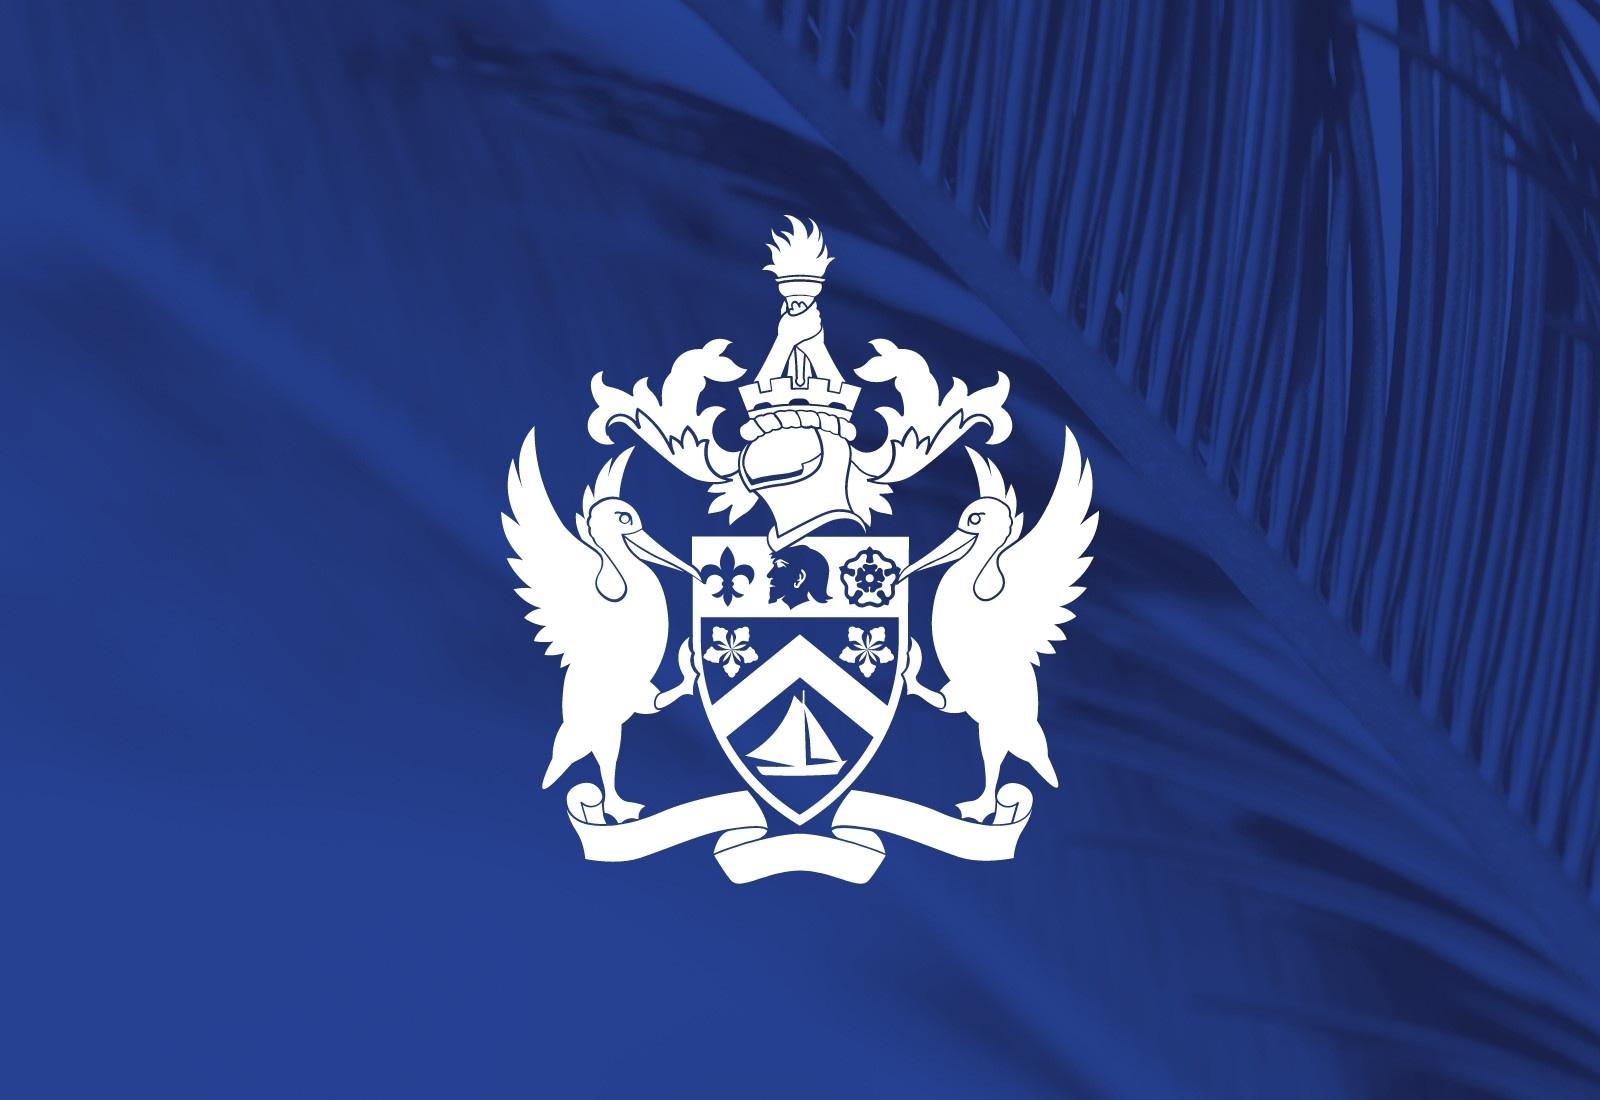 St Kitts & Nevis Citizenship by Investment Program